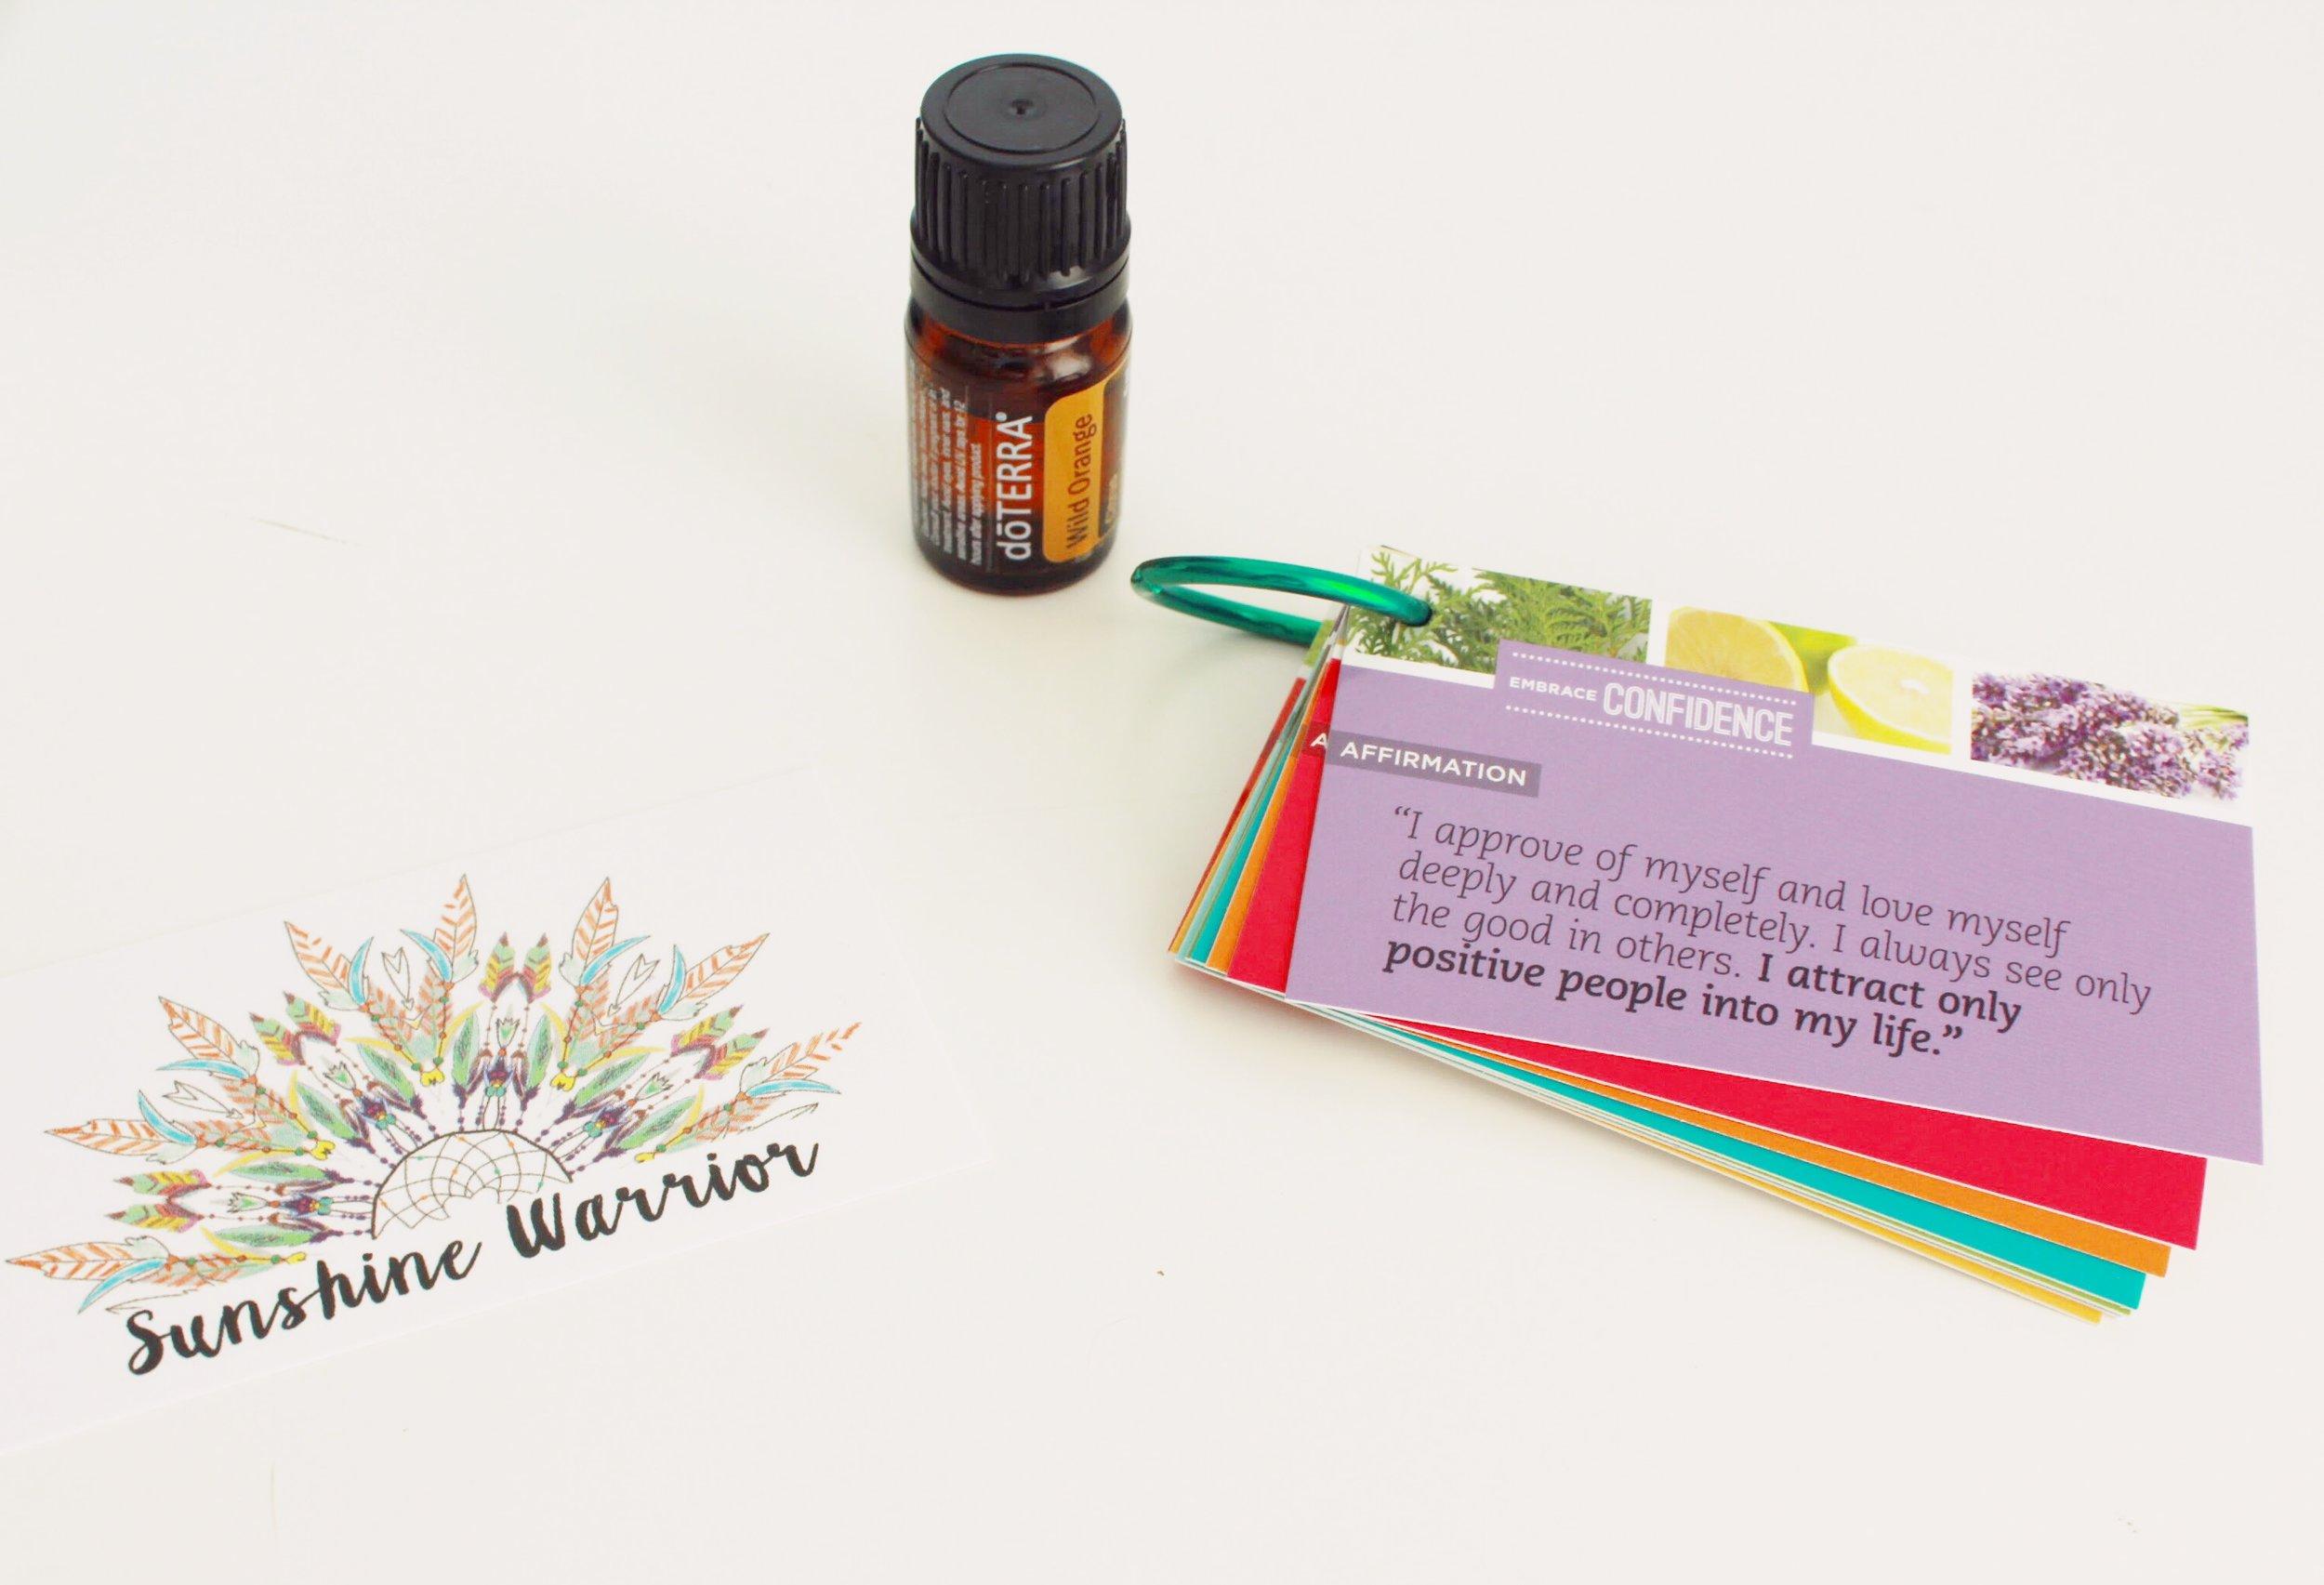 Sunshine Warrior by Gina DeRoos. DoTerra Wild Orange Essential Oil and Daily Affirmation Cards.